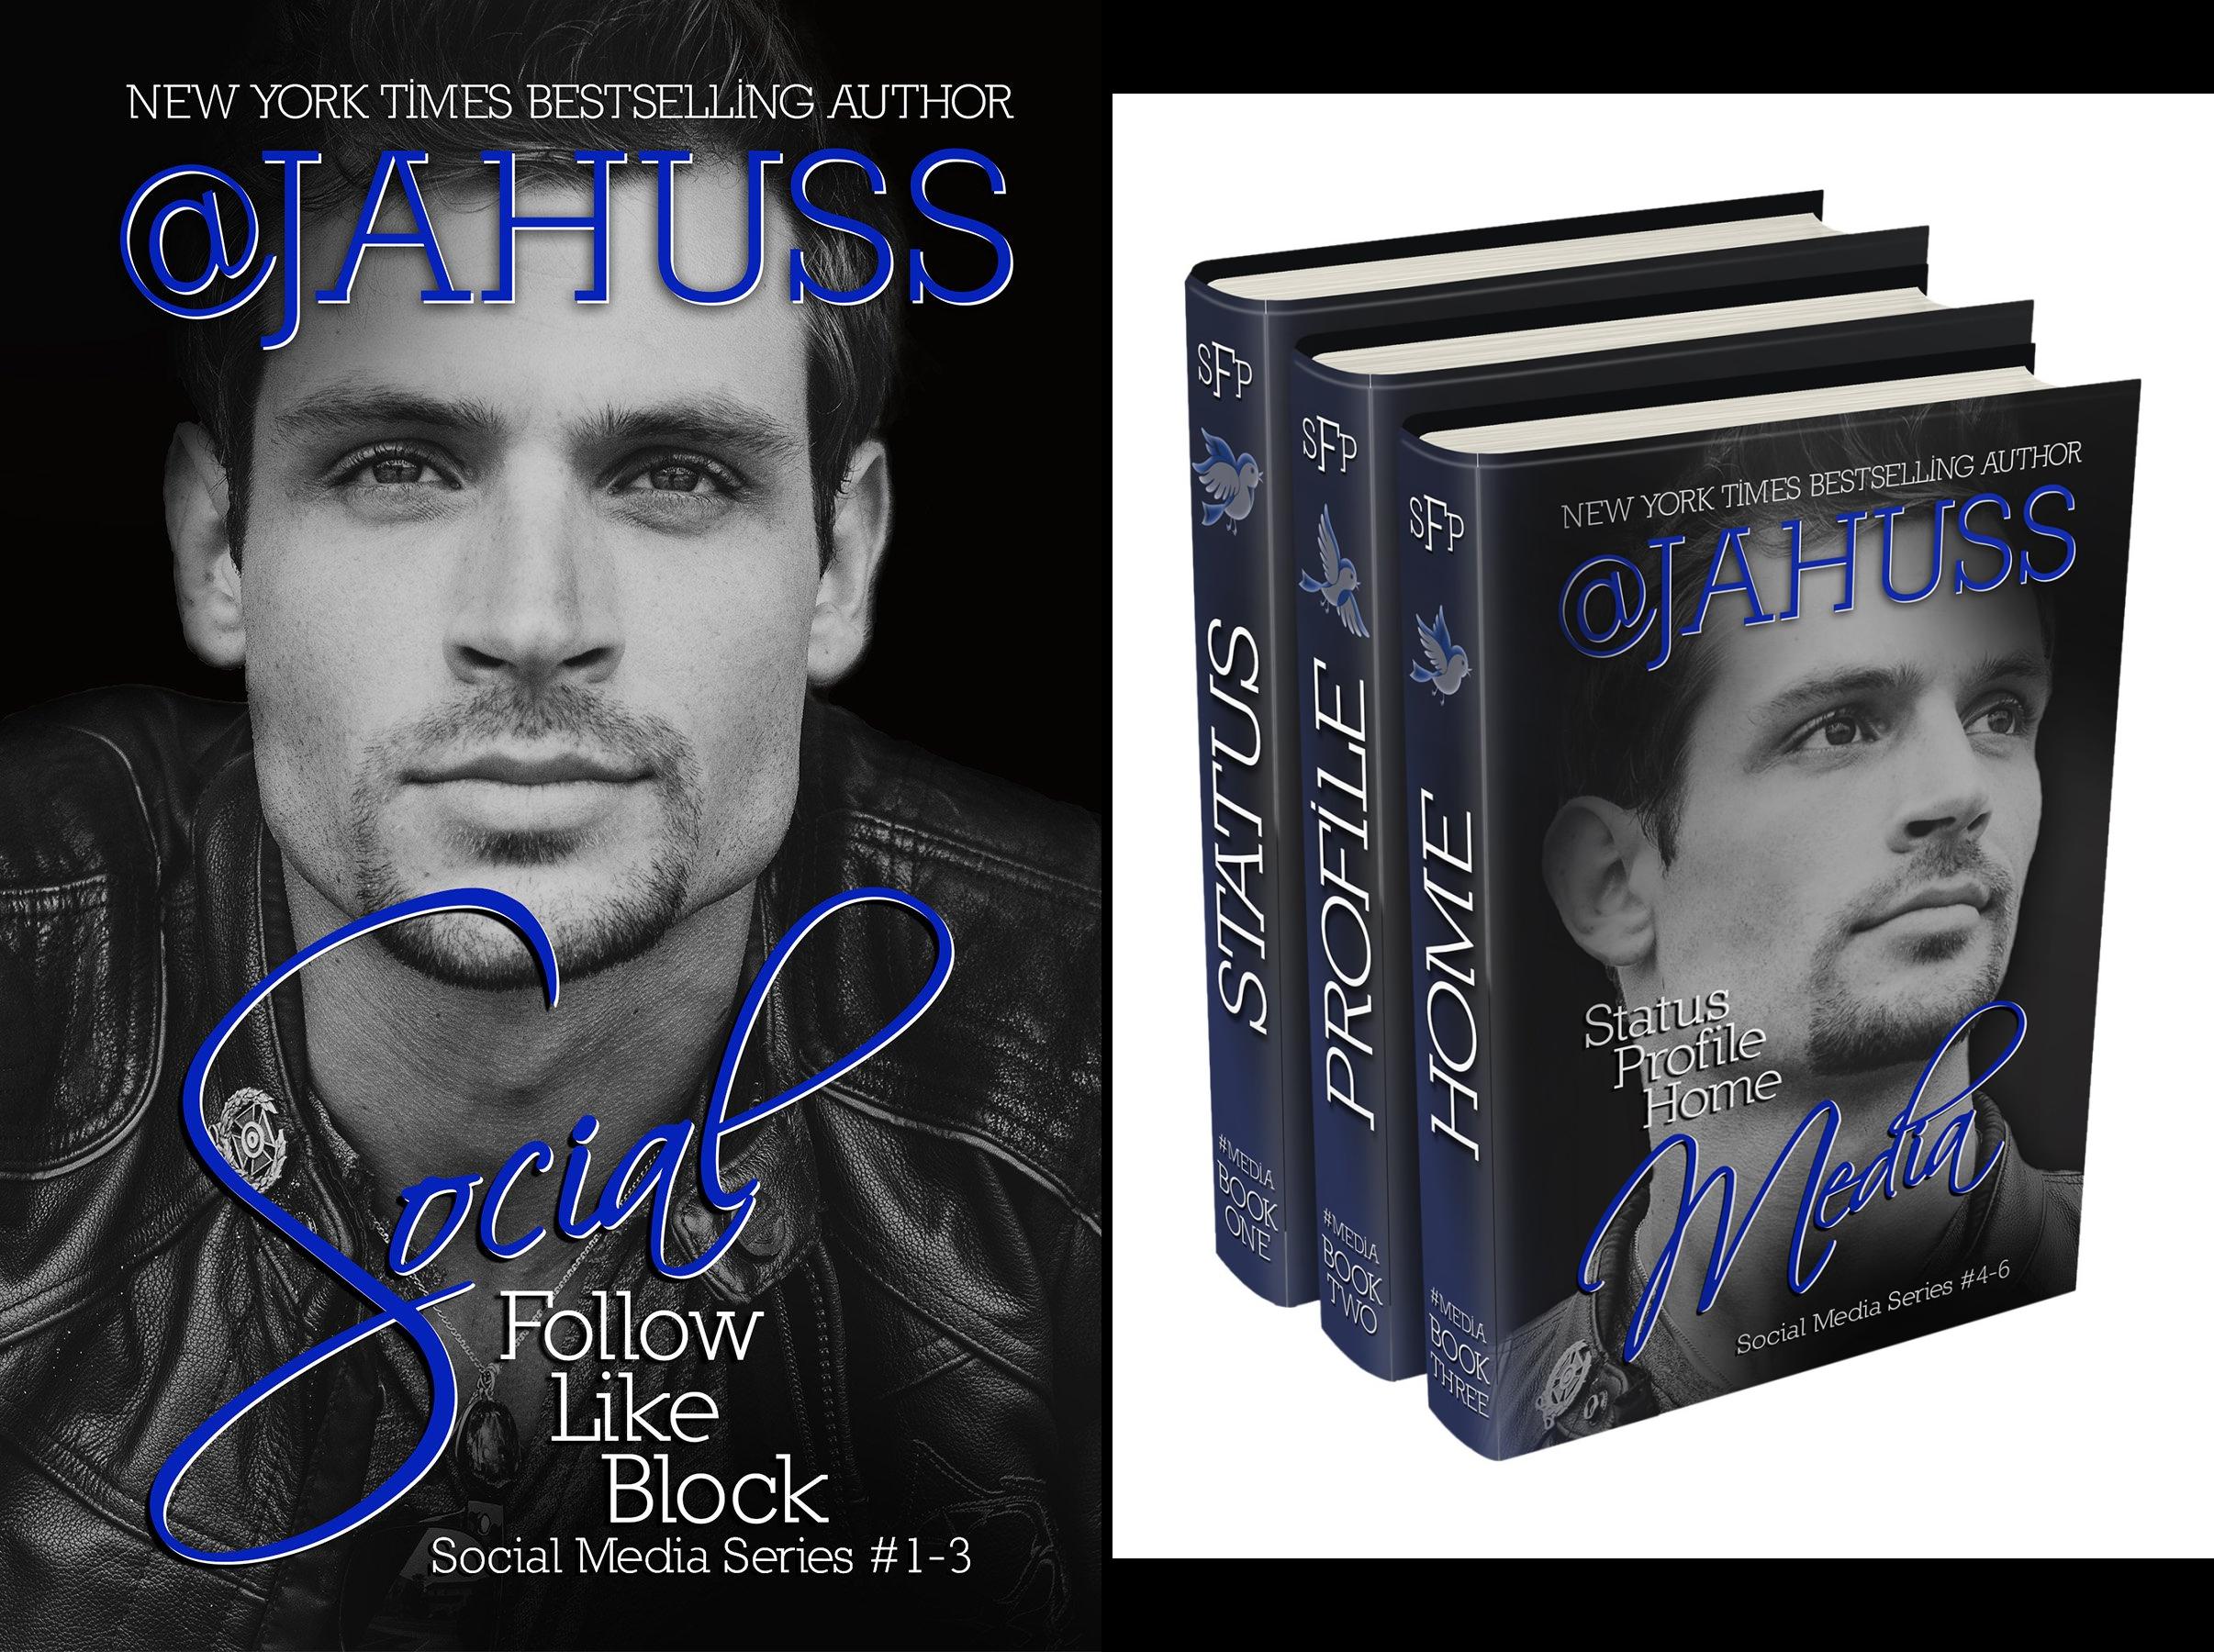 Download Epub: The Social Media Bundle Series (2 Book Series) Free Book Epub